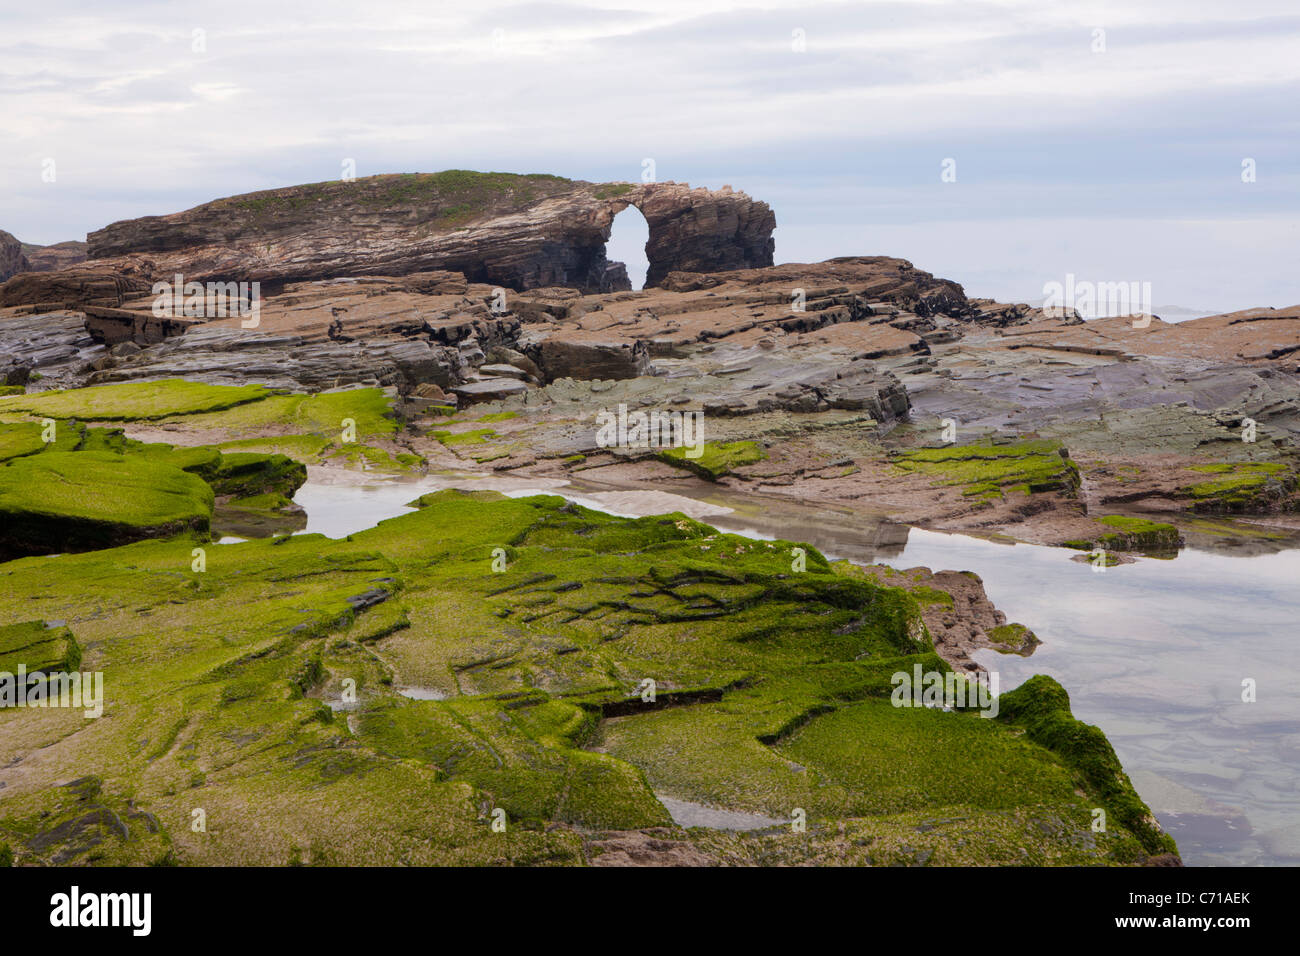 Beach of the cathedrals - Praia As Catedrais -, Ribadeo, Lugo, Galicia, Spain - Stock Image